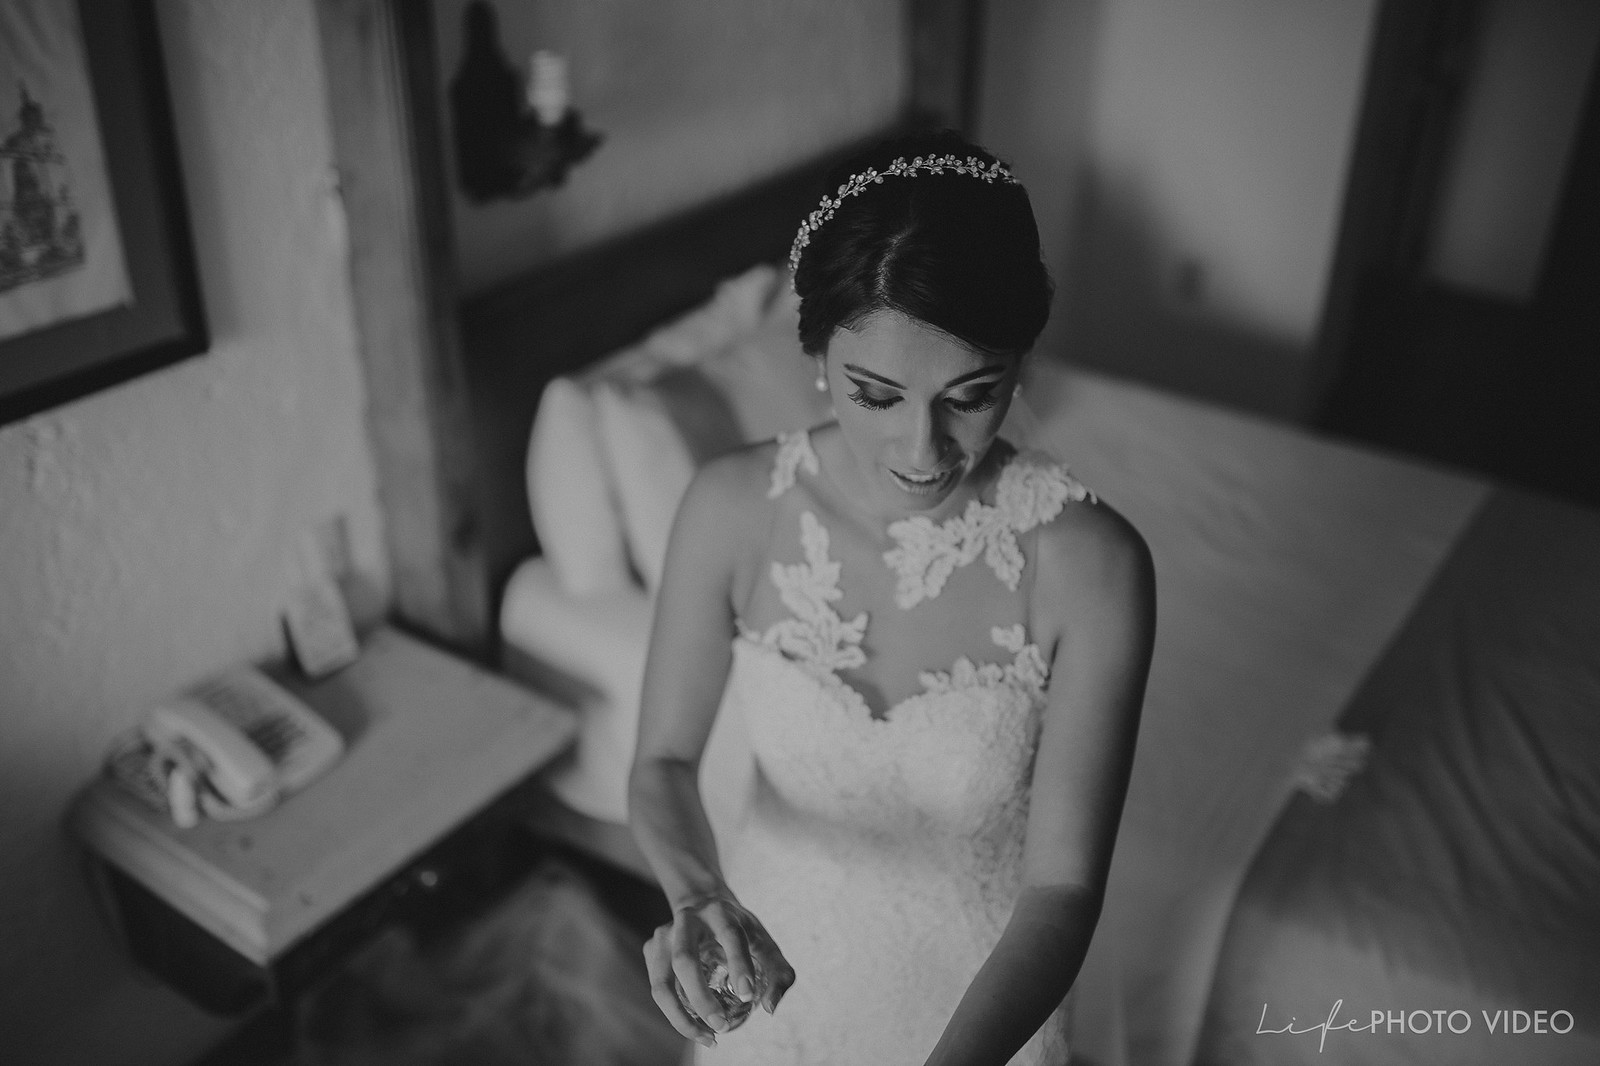 LifePhotoVideo_Boda_Guanajuato_Wedding_0013